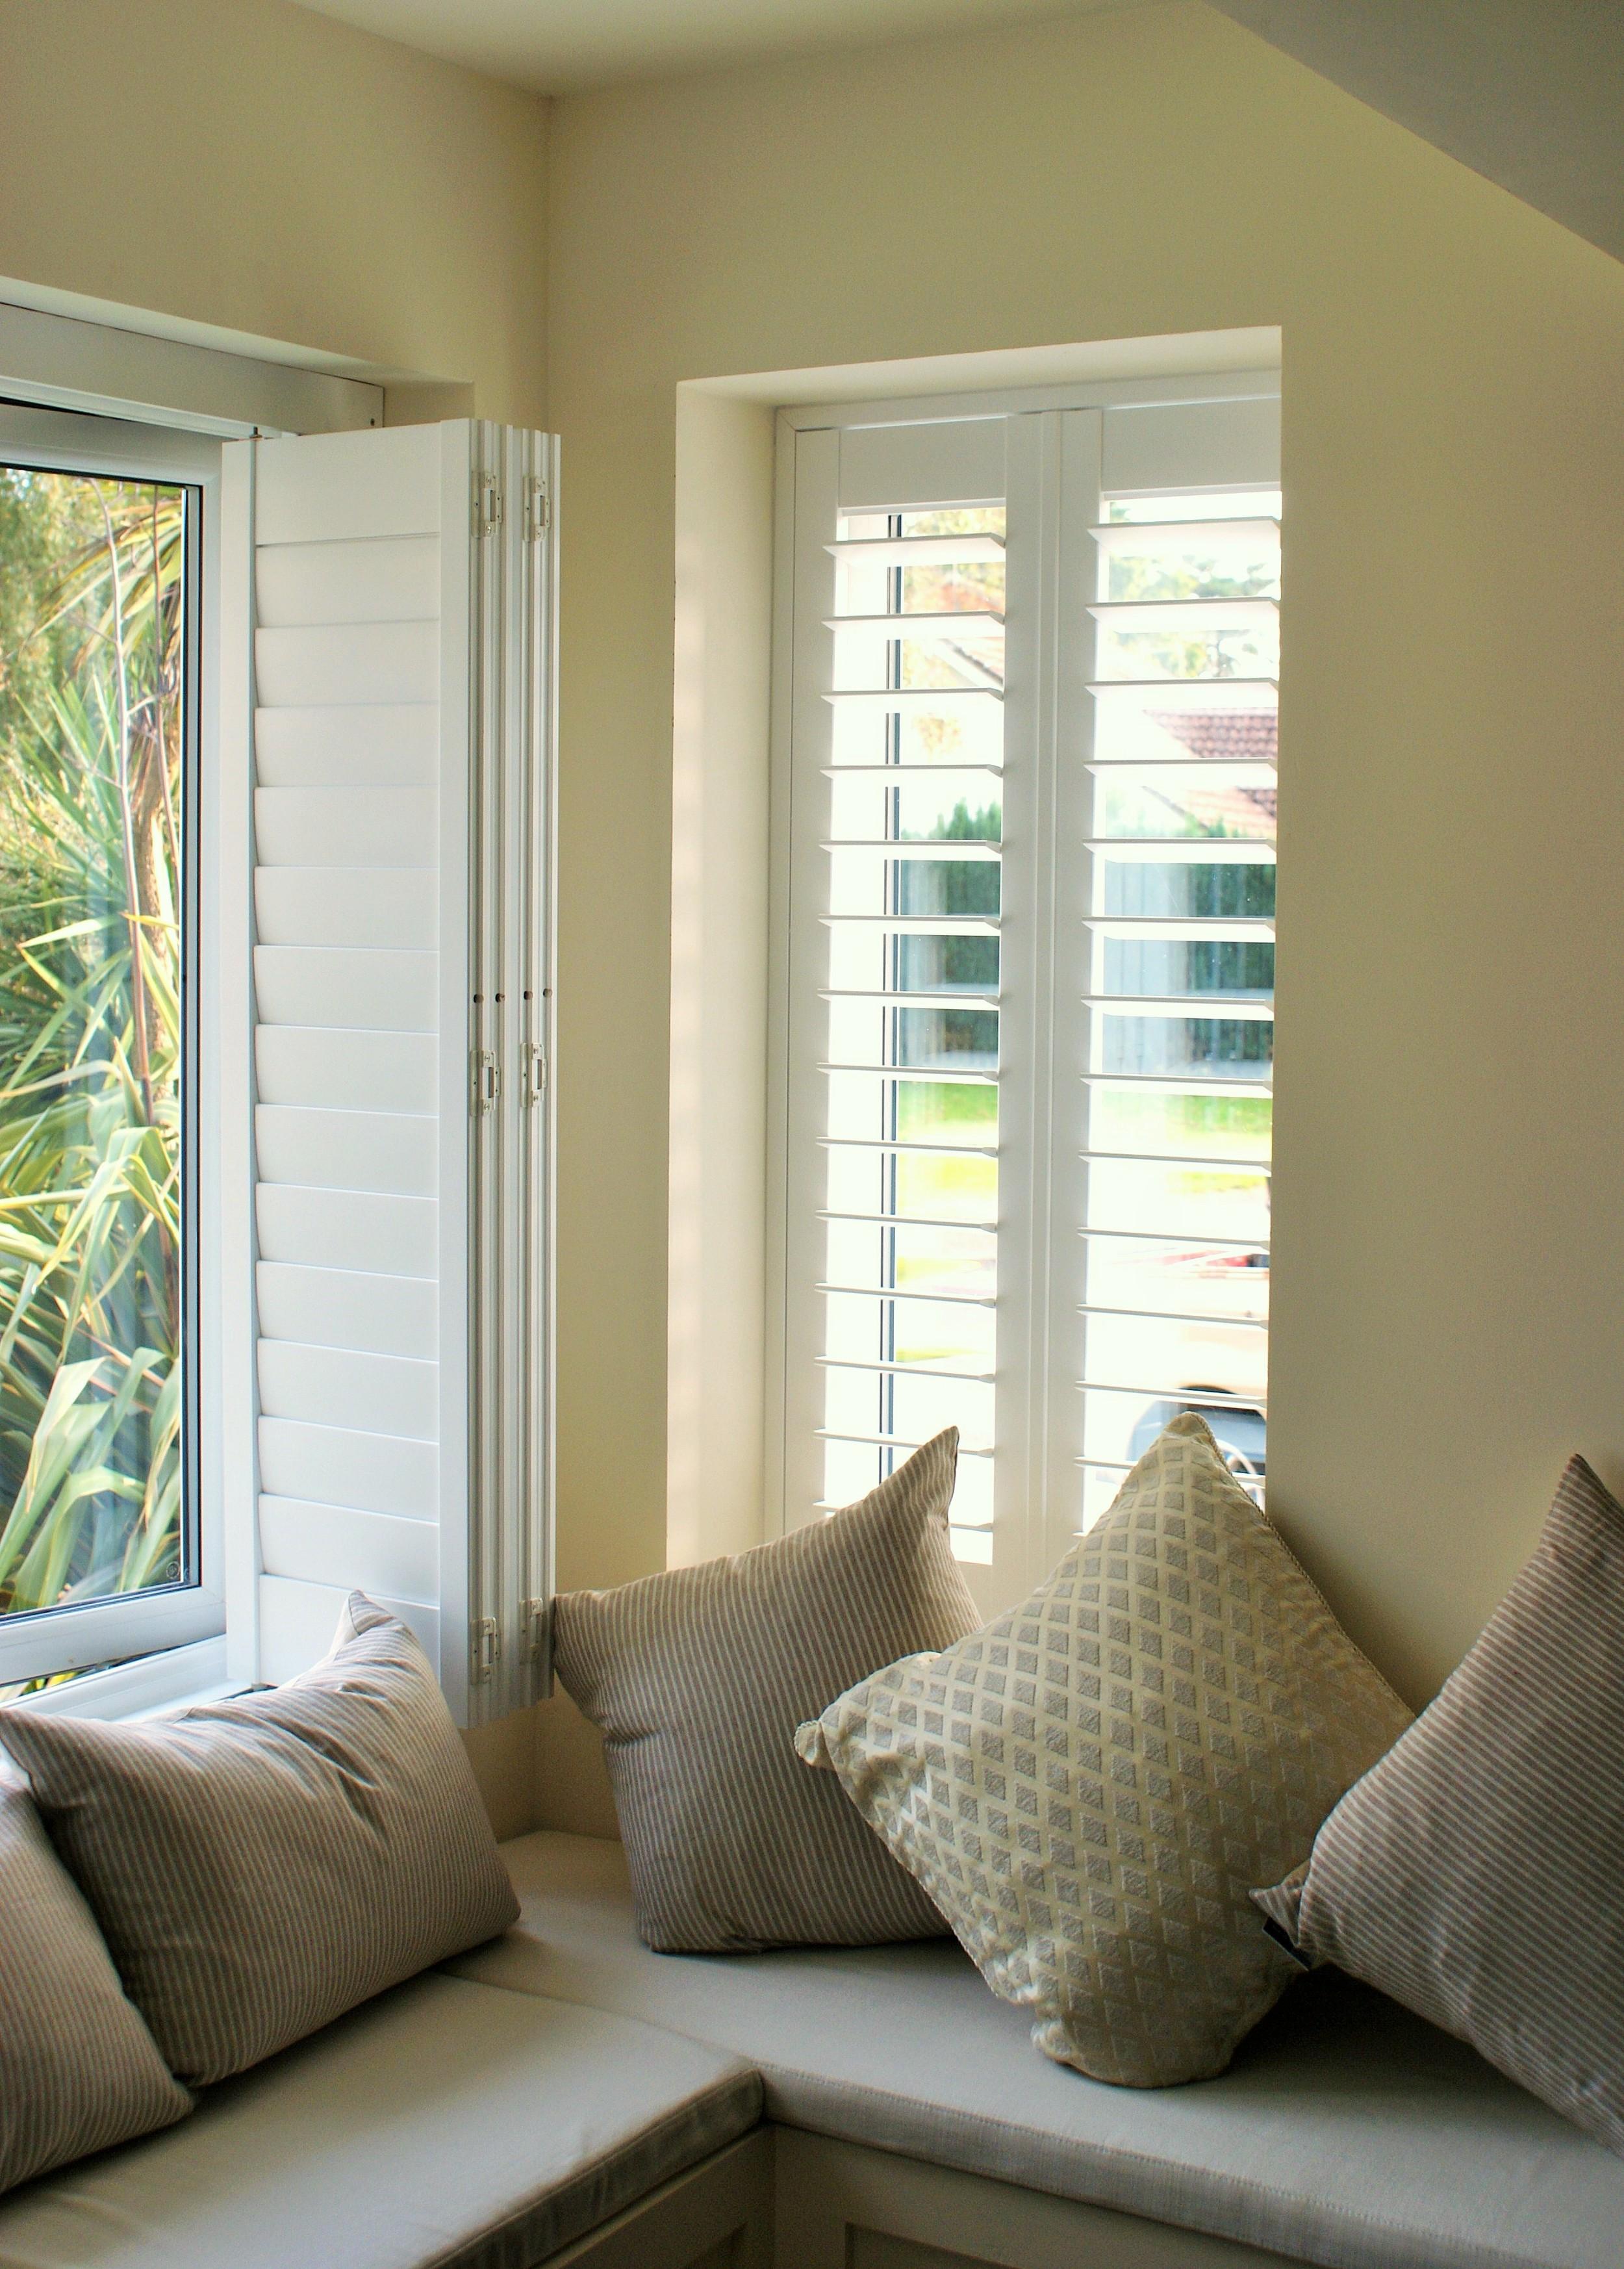 Superb  bay window seat with window shutters Verwood Bournemouth